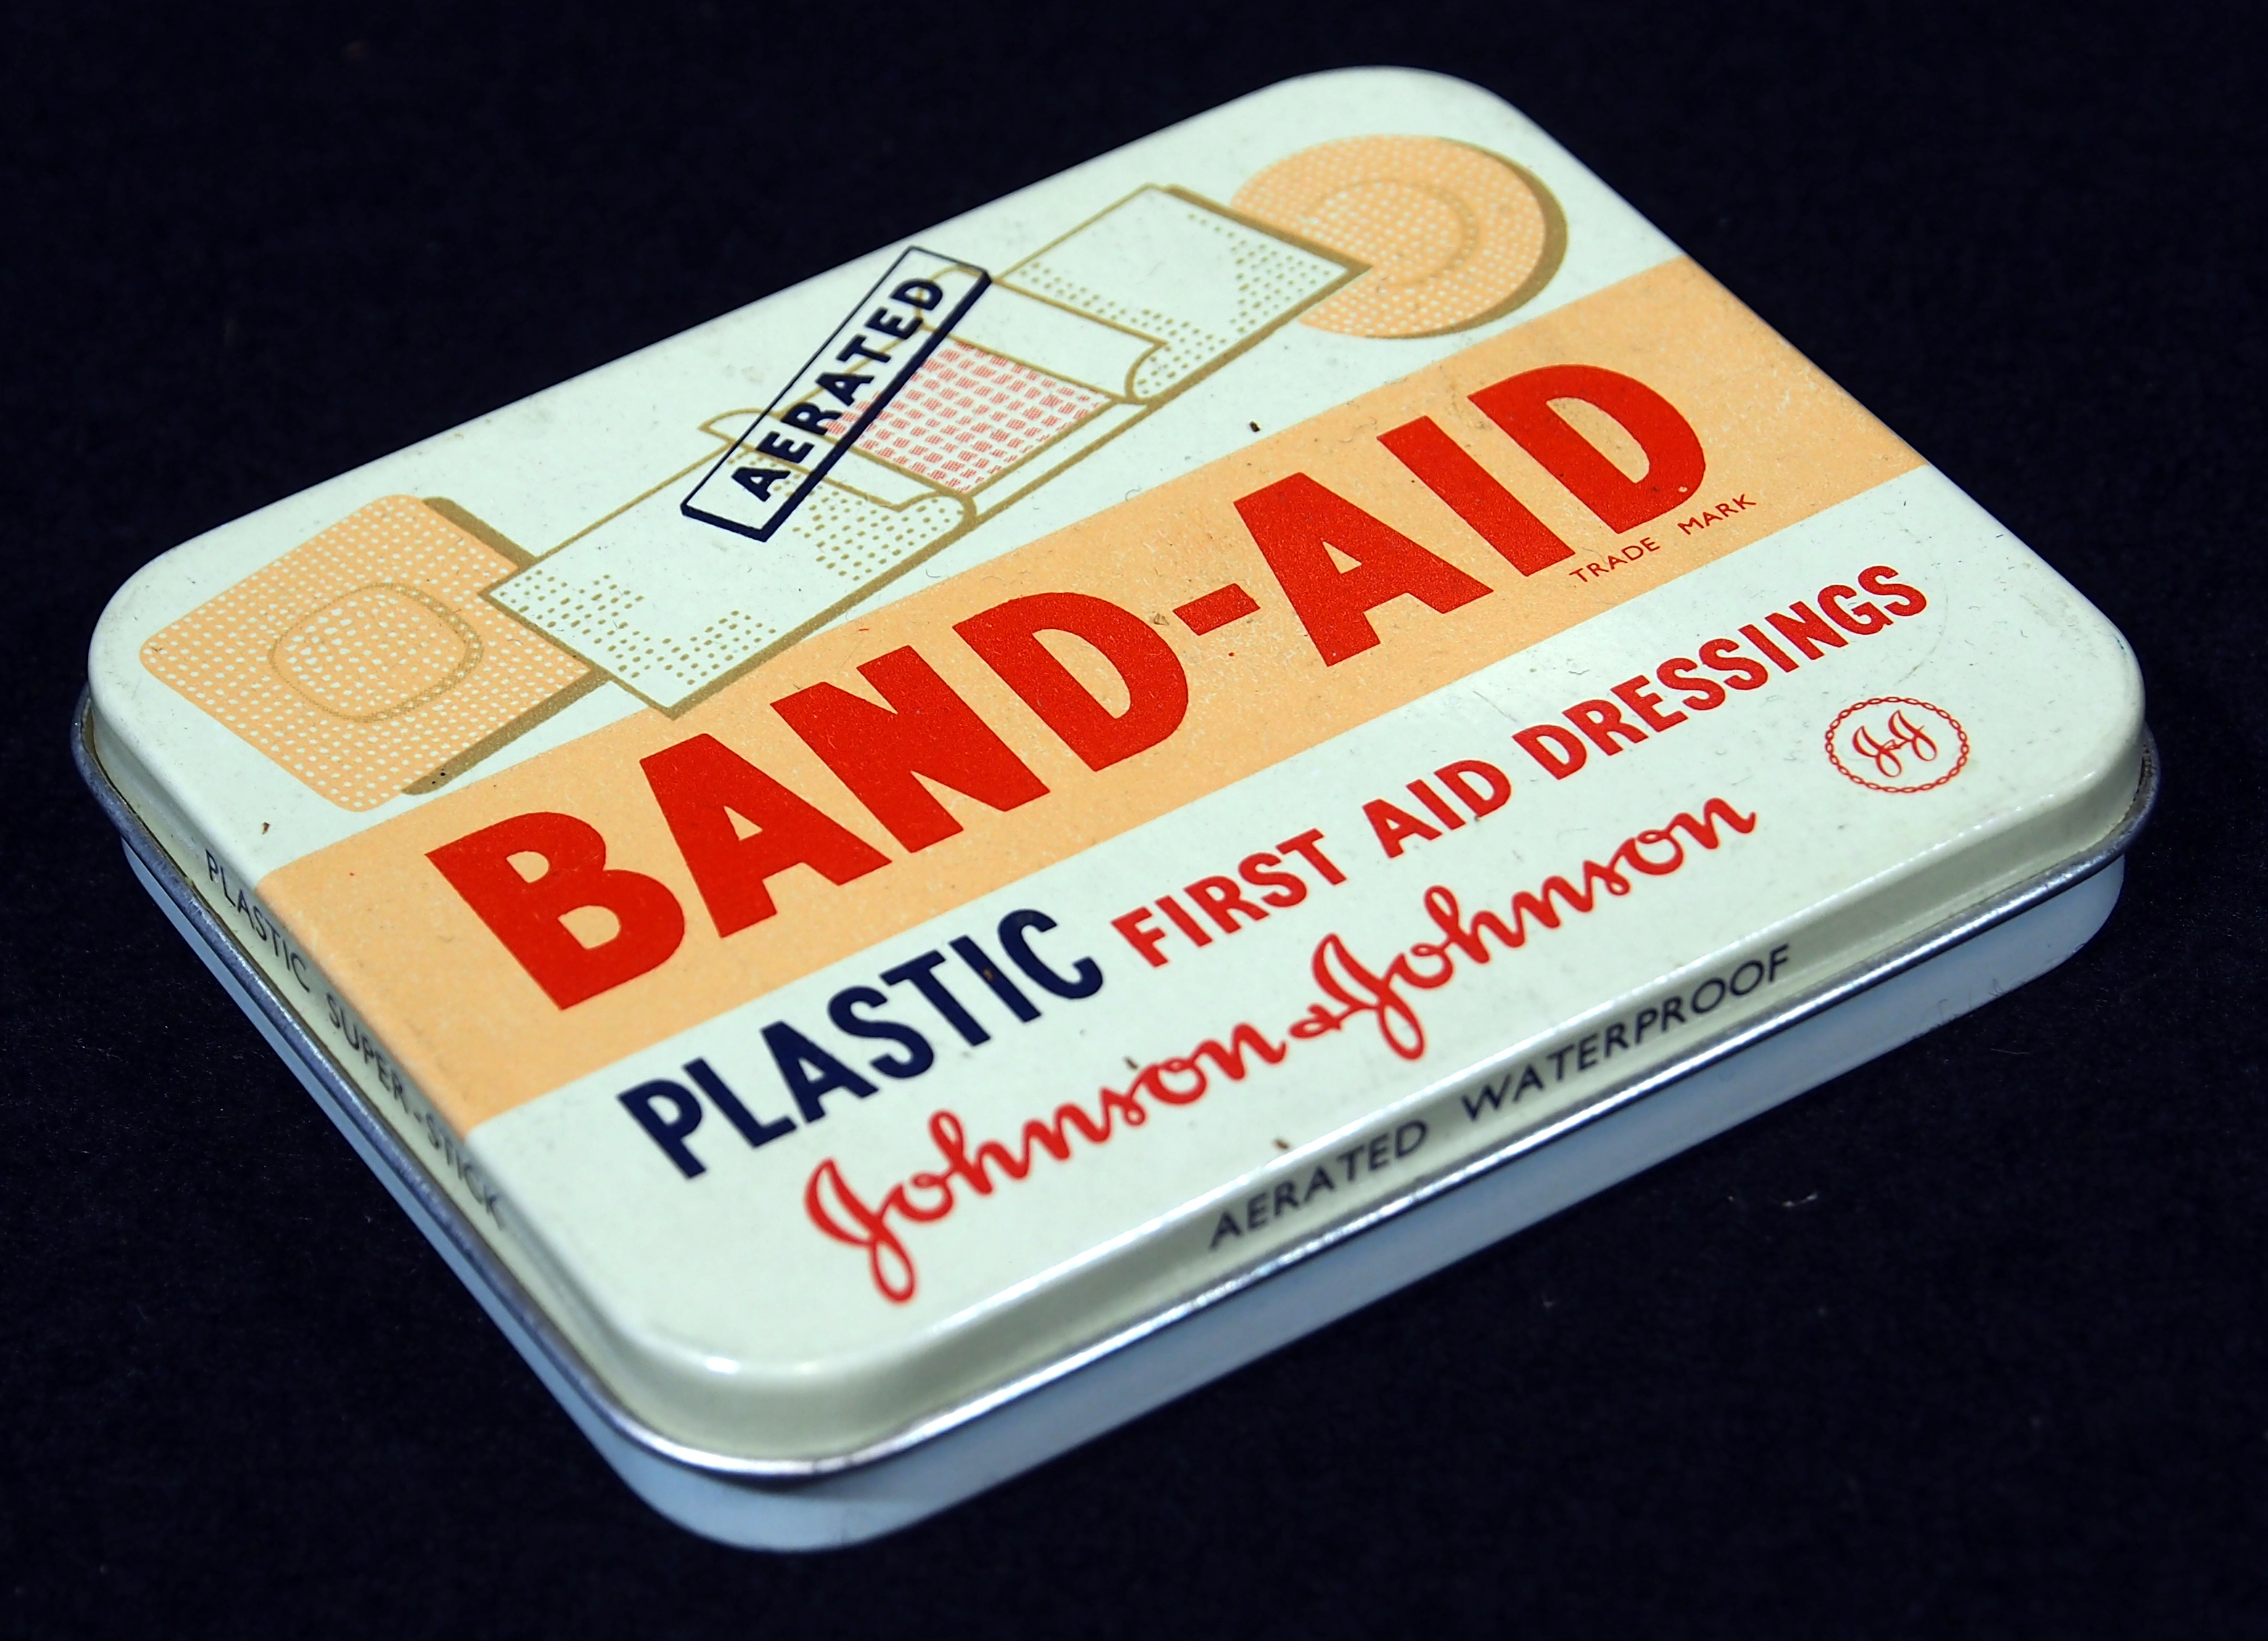 https://upload.wikimedia.org/wikipedia/commons/b/b7/Johnson%26Johnson_Band-Aid_tin,_pic2.JPG